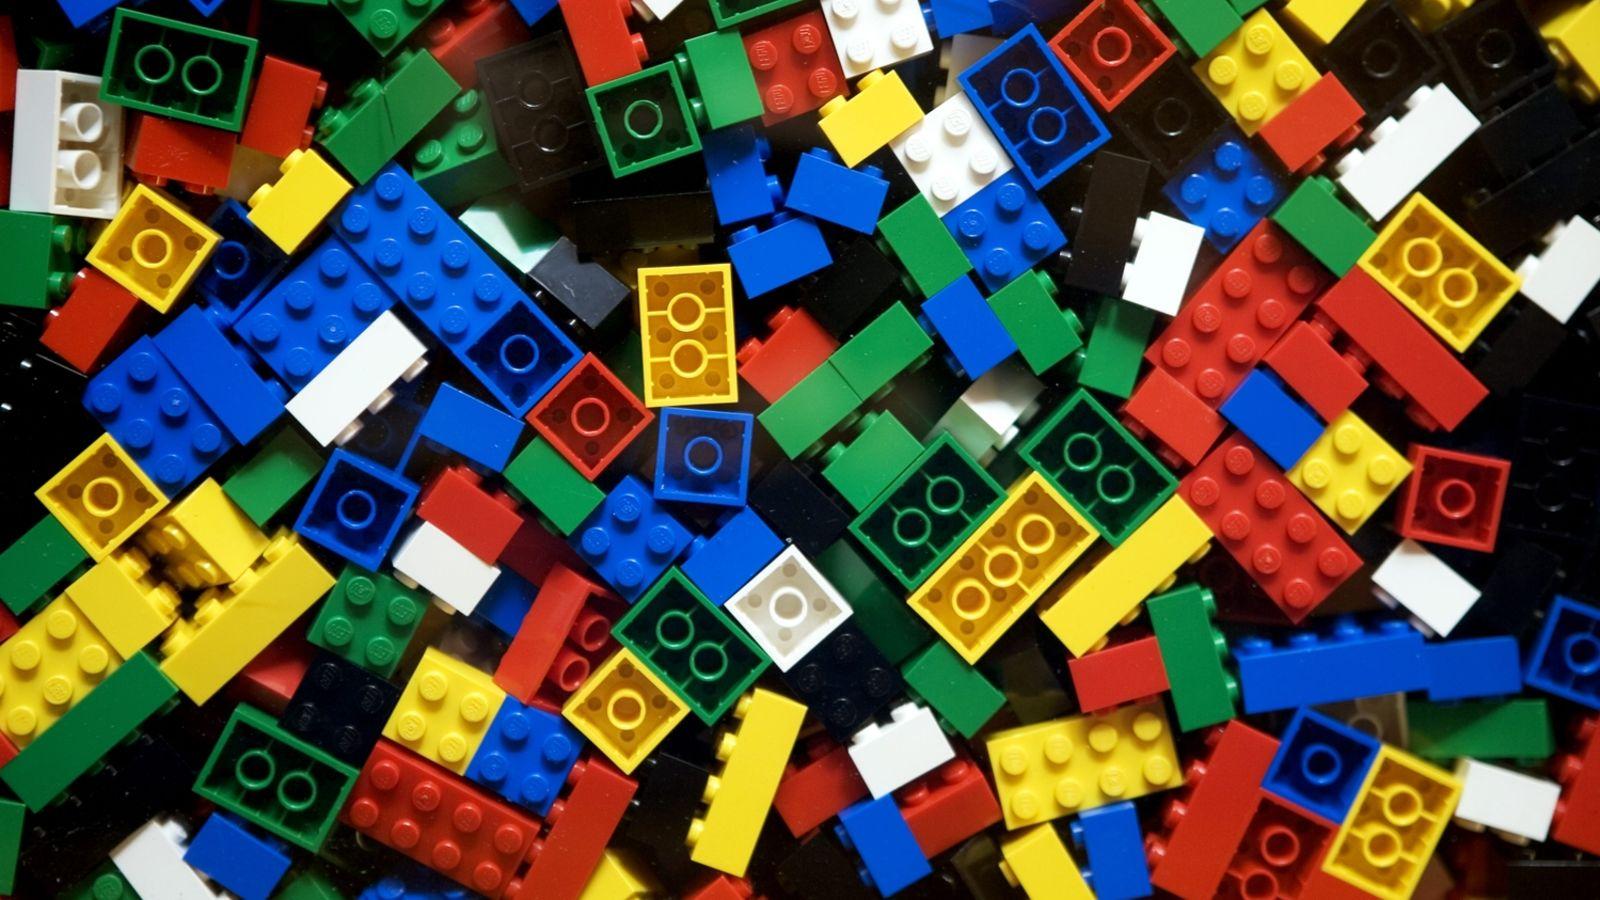 Lego - i.kinja-img.com